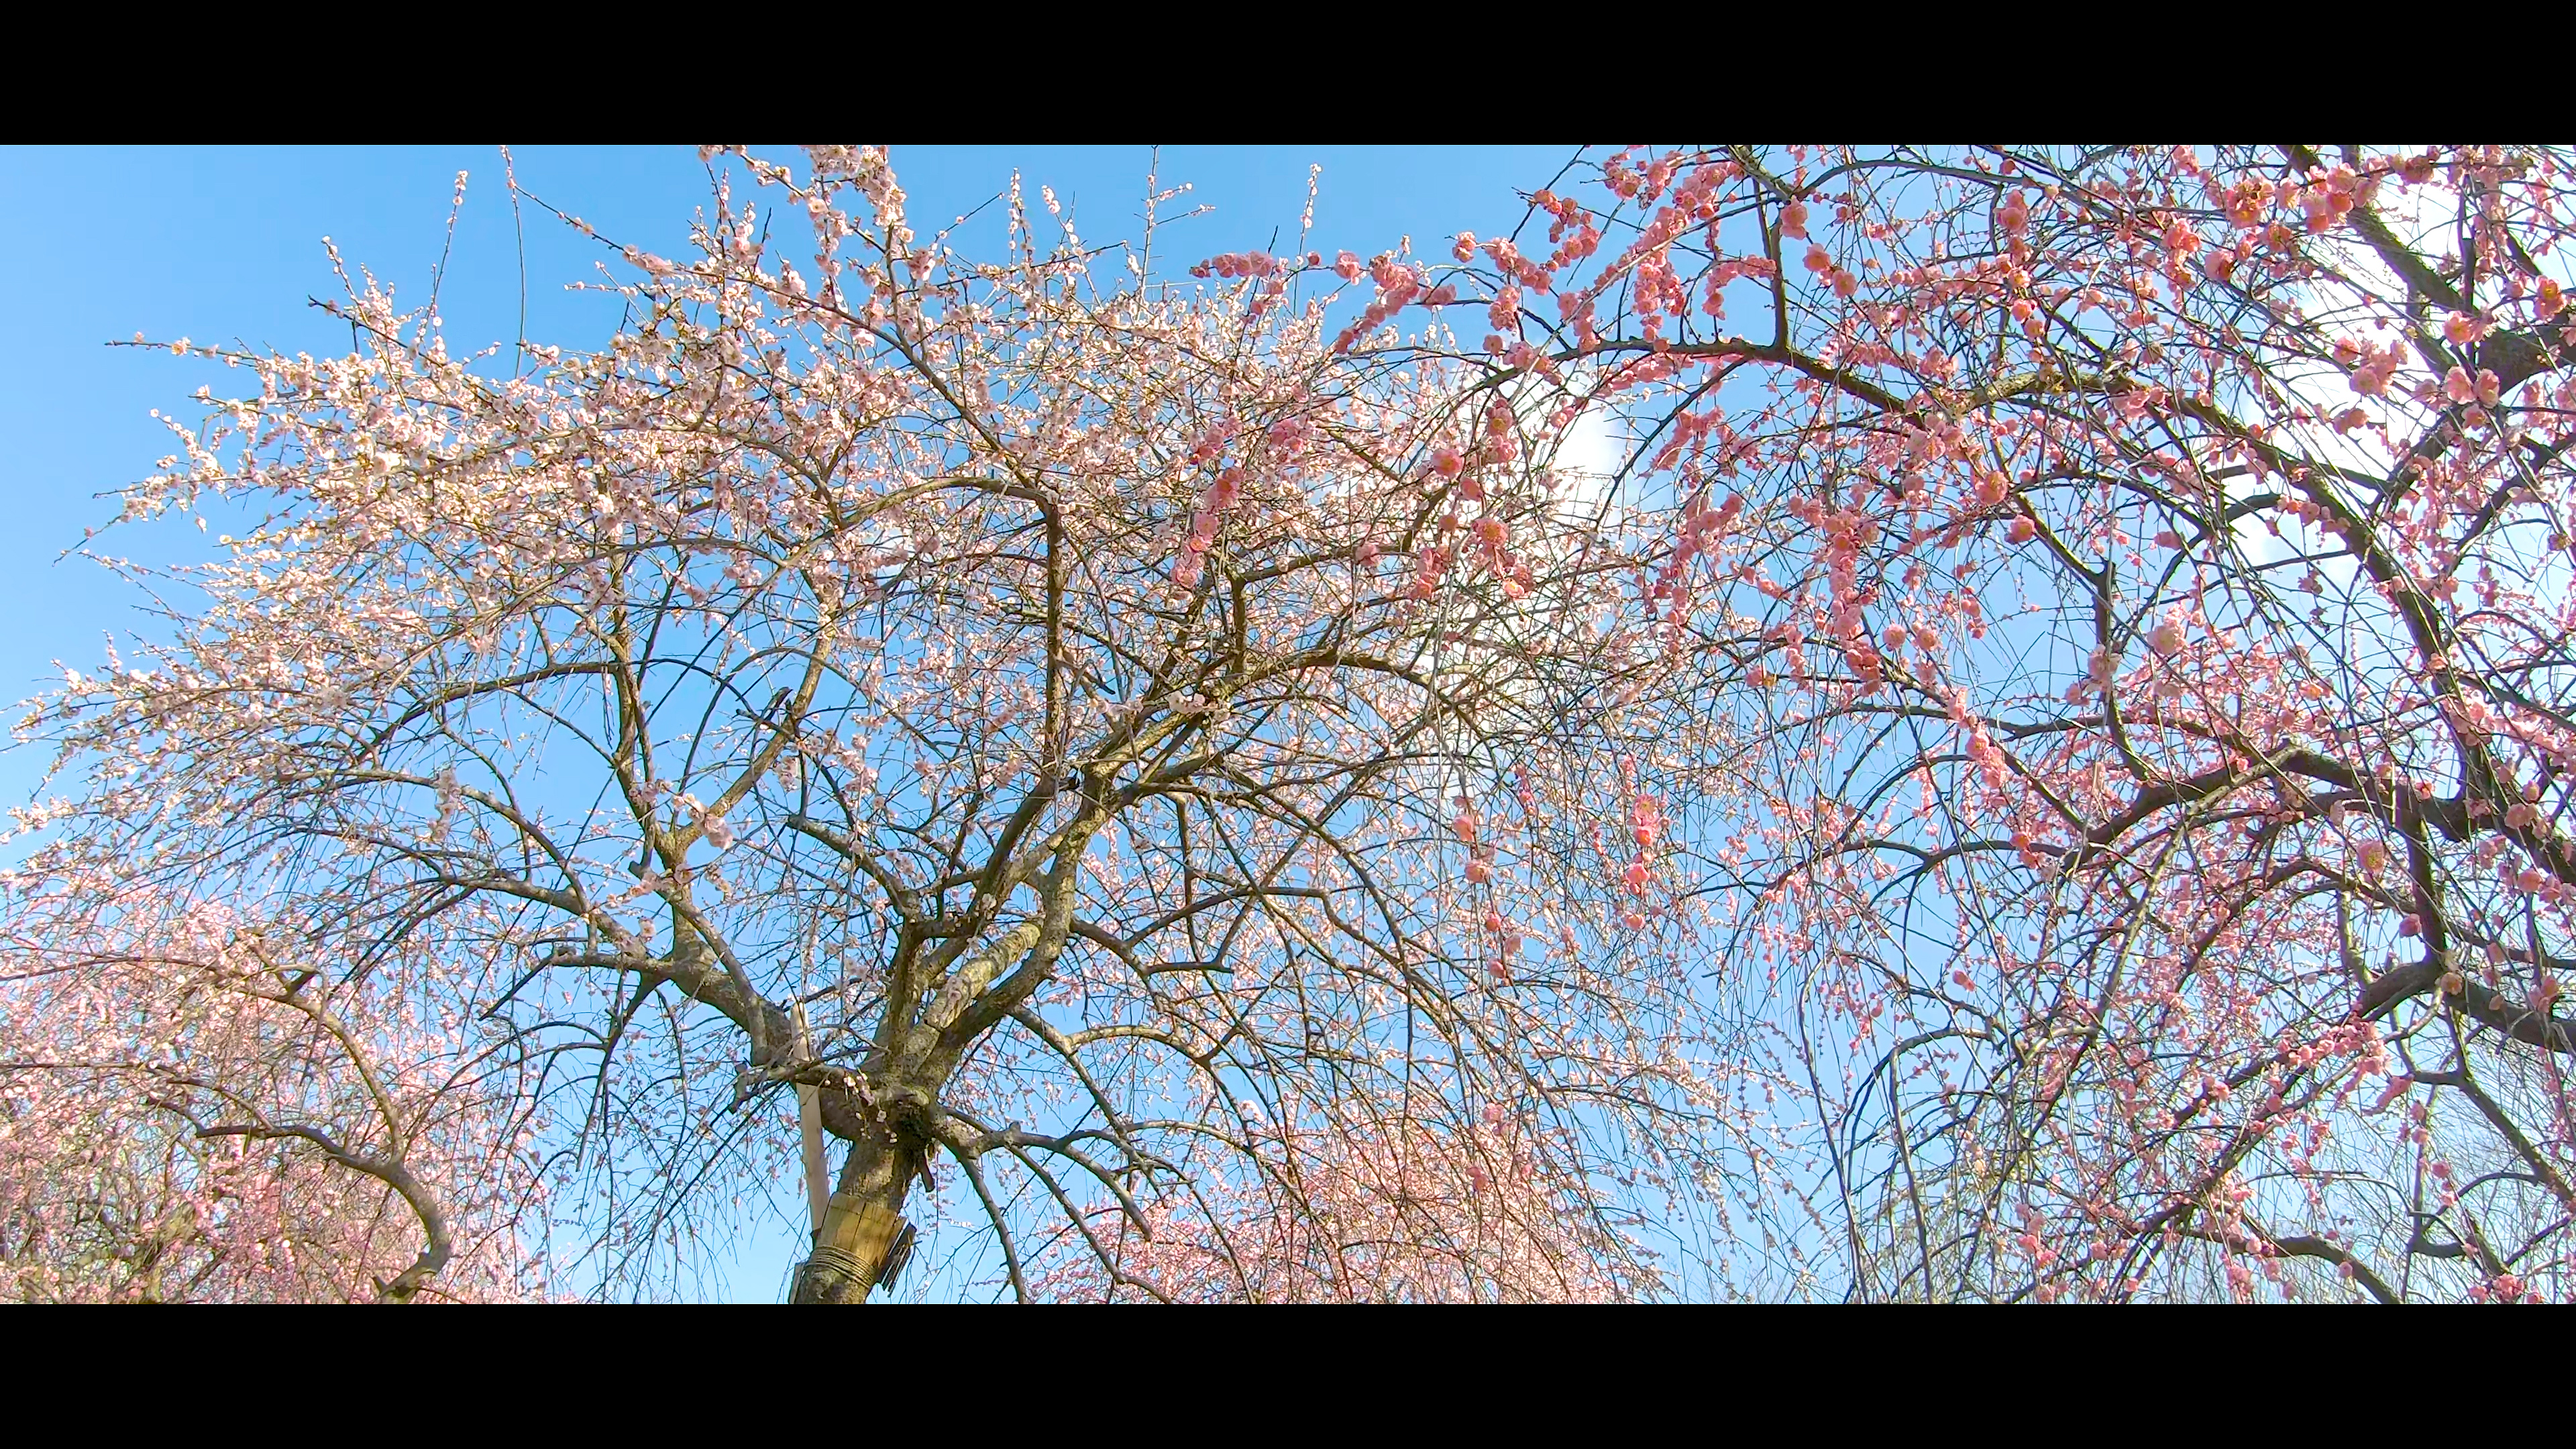 d4aa6768f38beaaa4b681b452b1b1a49 大阪府 和泉リサイクル環境公園(梅と水仙、菜の花が撮影できる春におすすめの写真スポット。 撮影した写真の紹介、アクセス情報や交通手段・駐車場情報などまとめ)